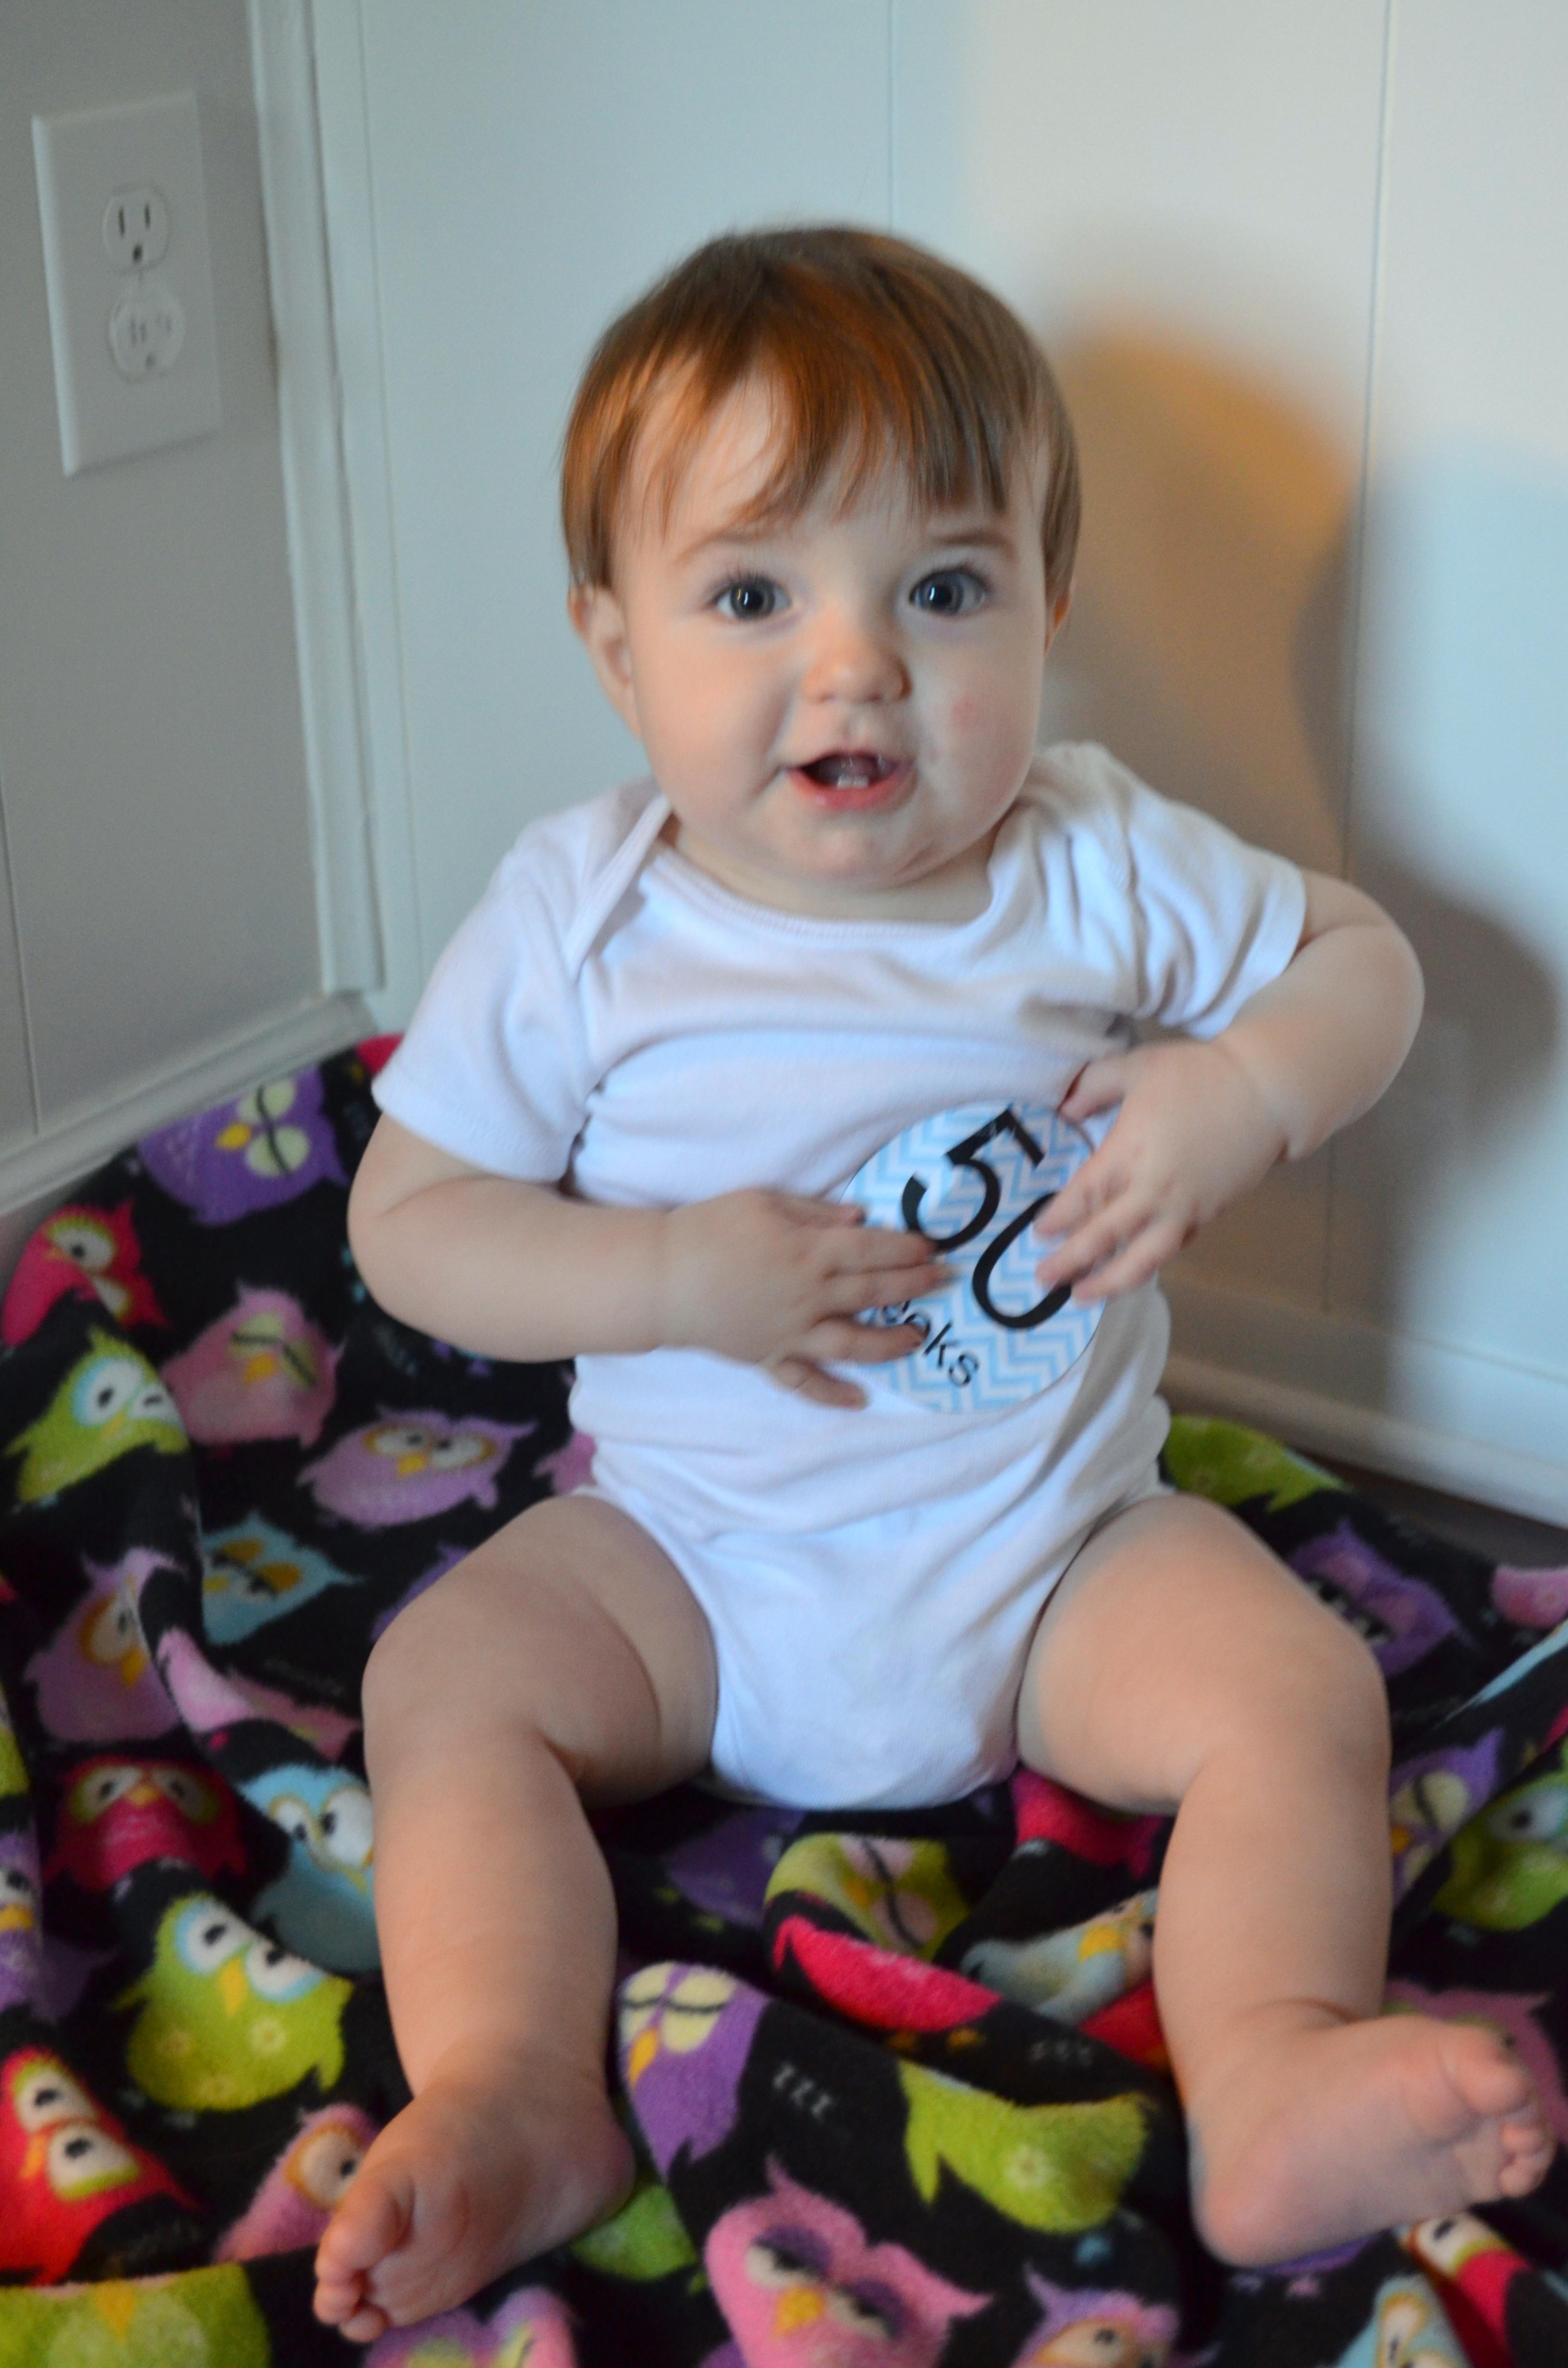 50 weeks old, jenson